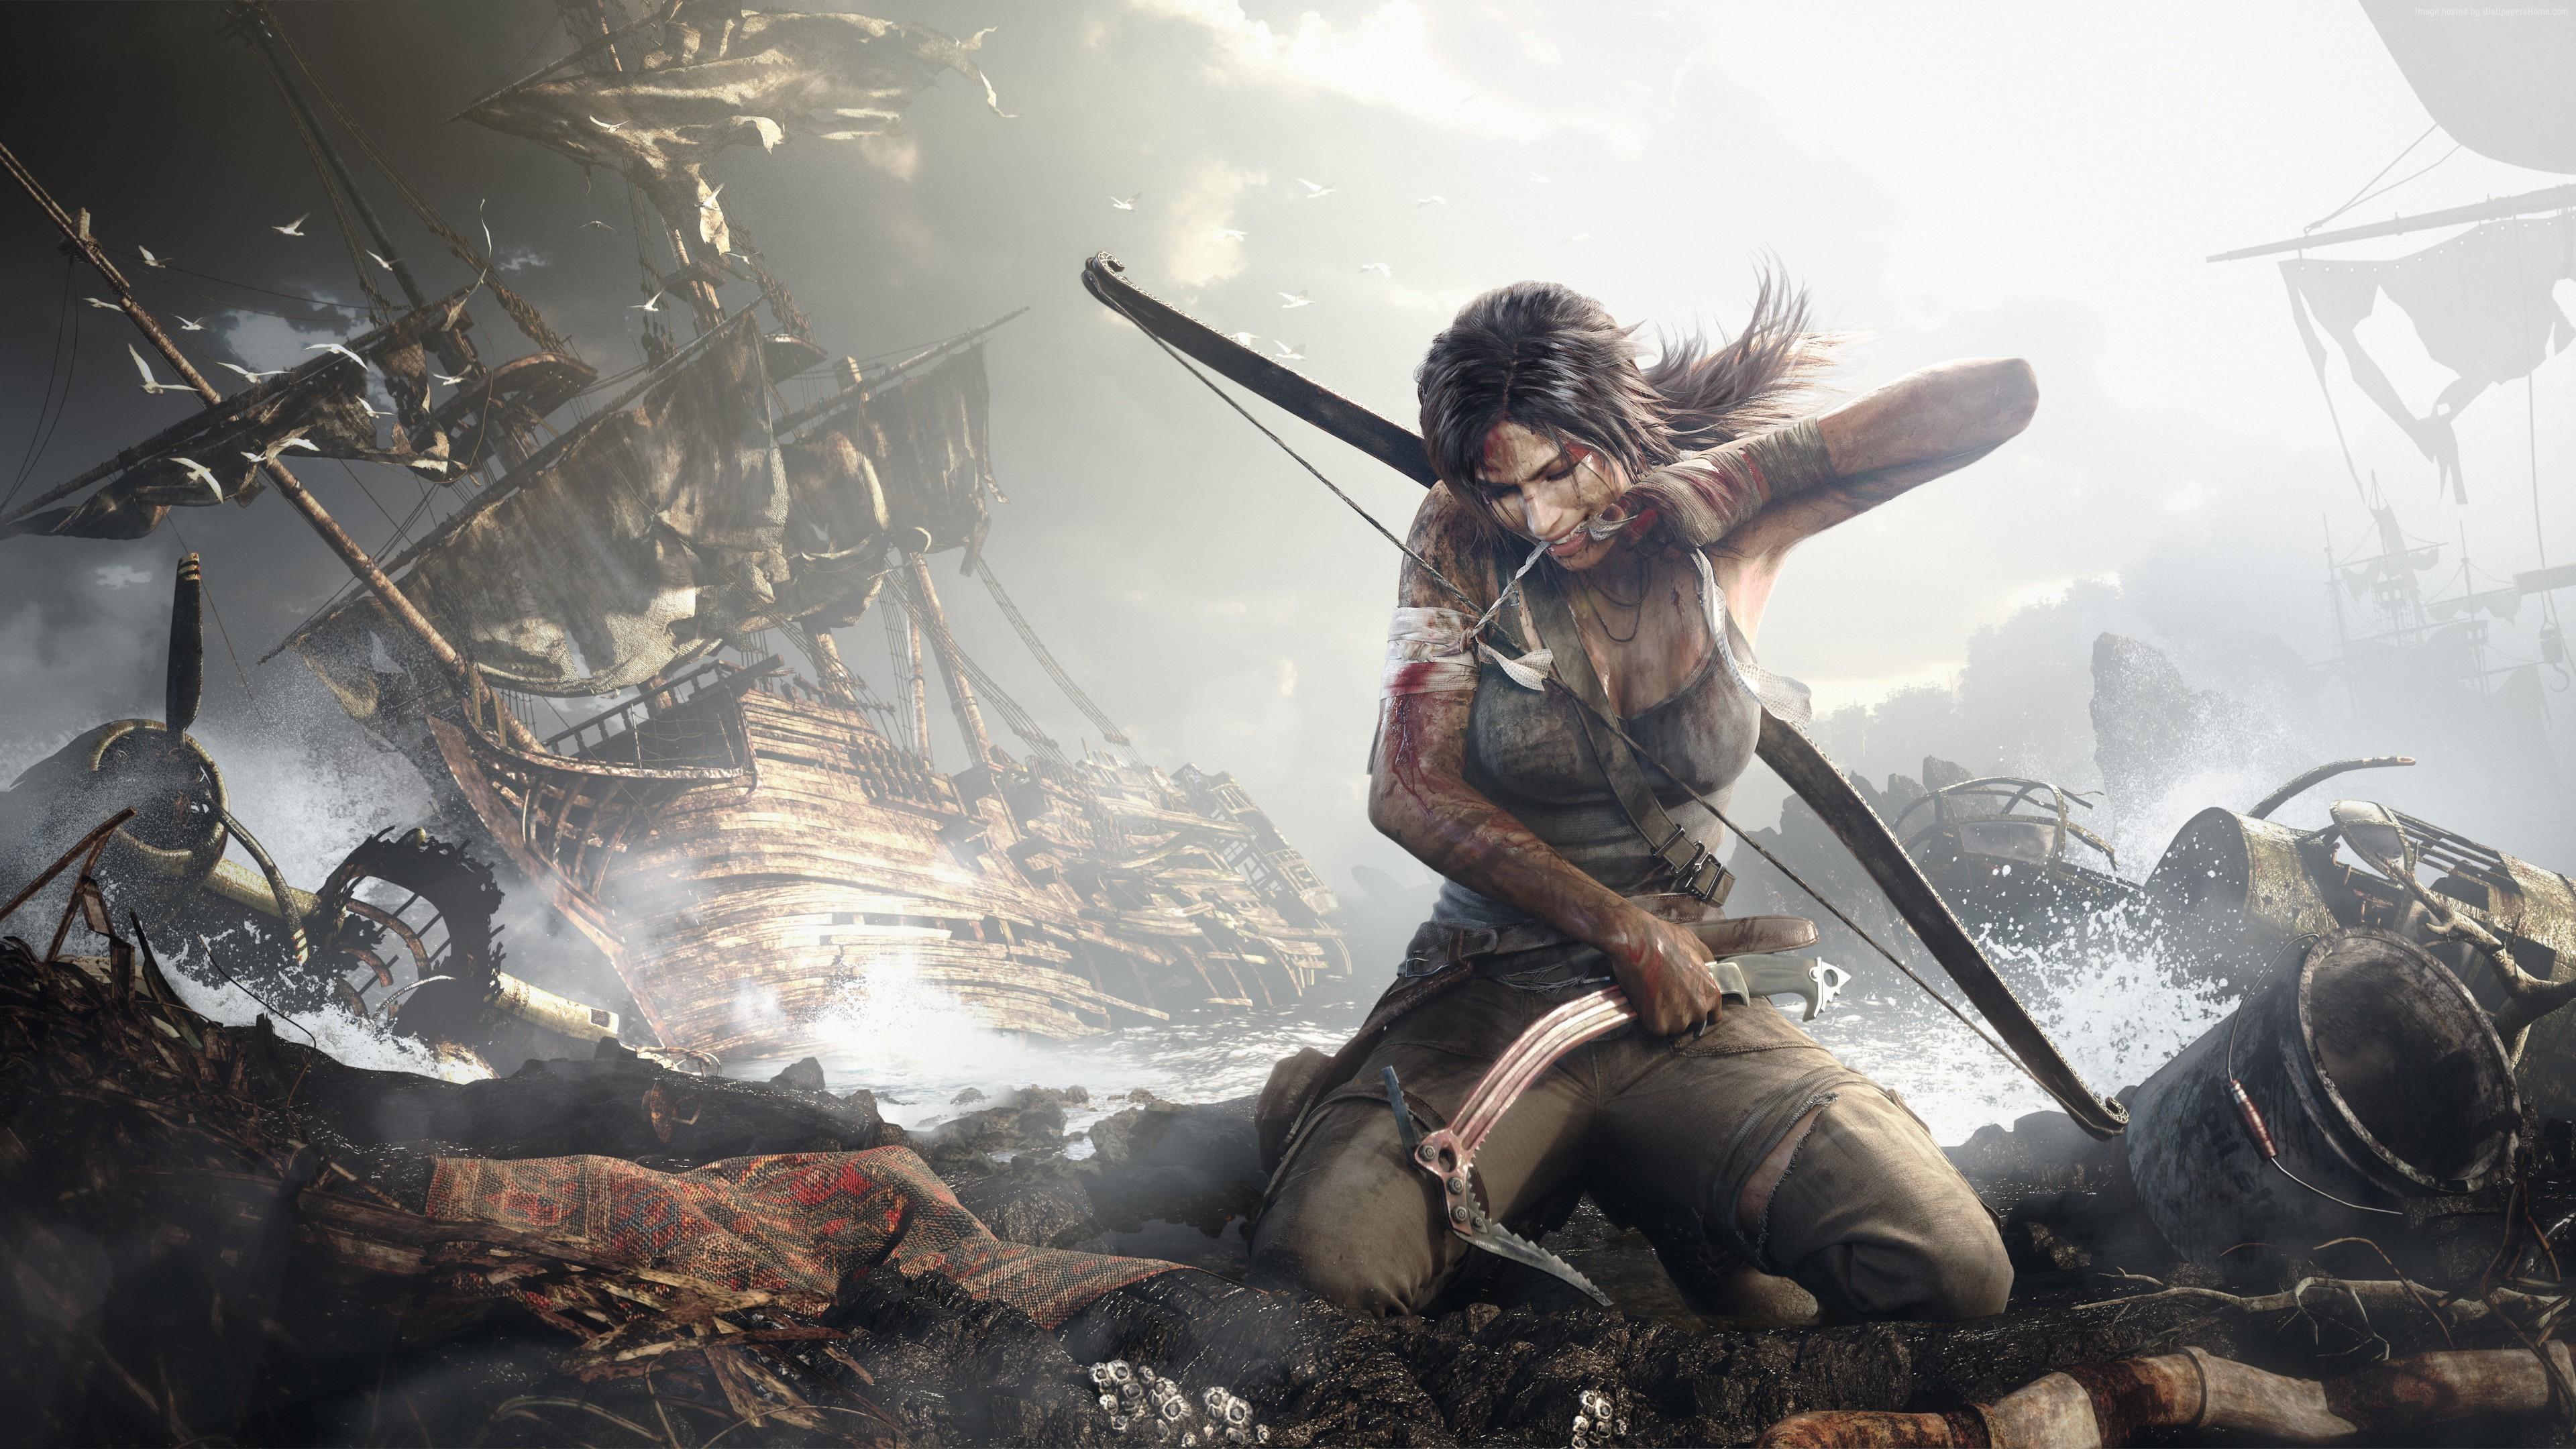 Papel De Parede : Videogames, Tomb Raider, Xbox One